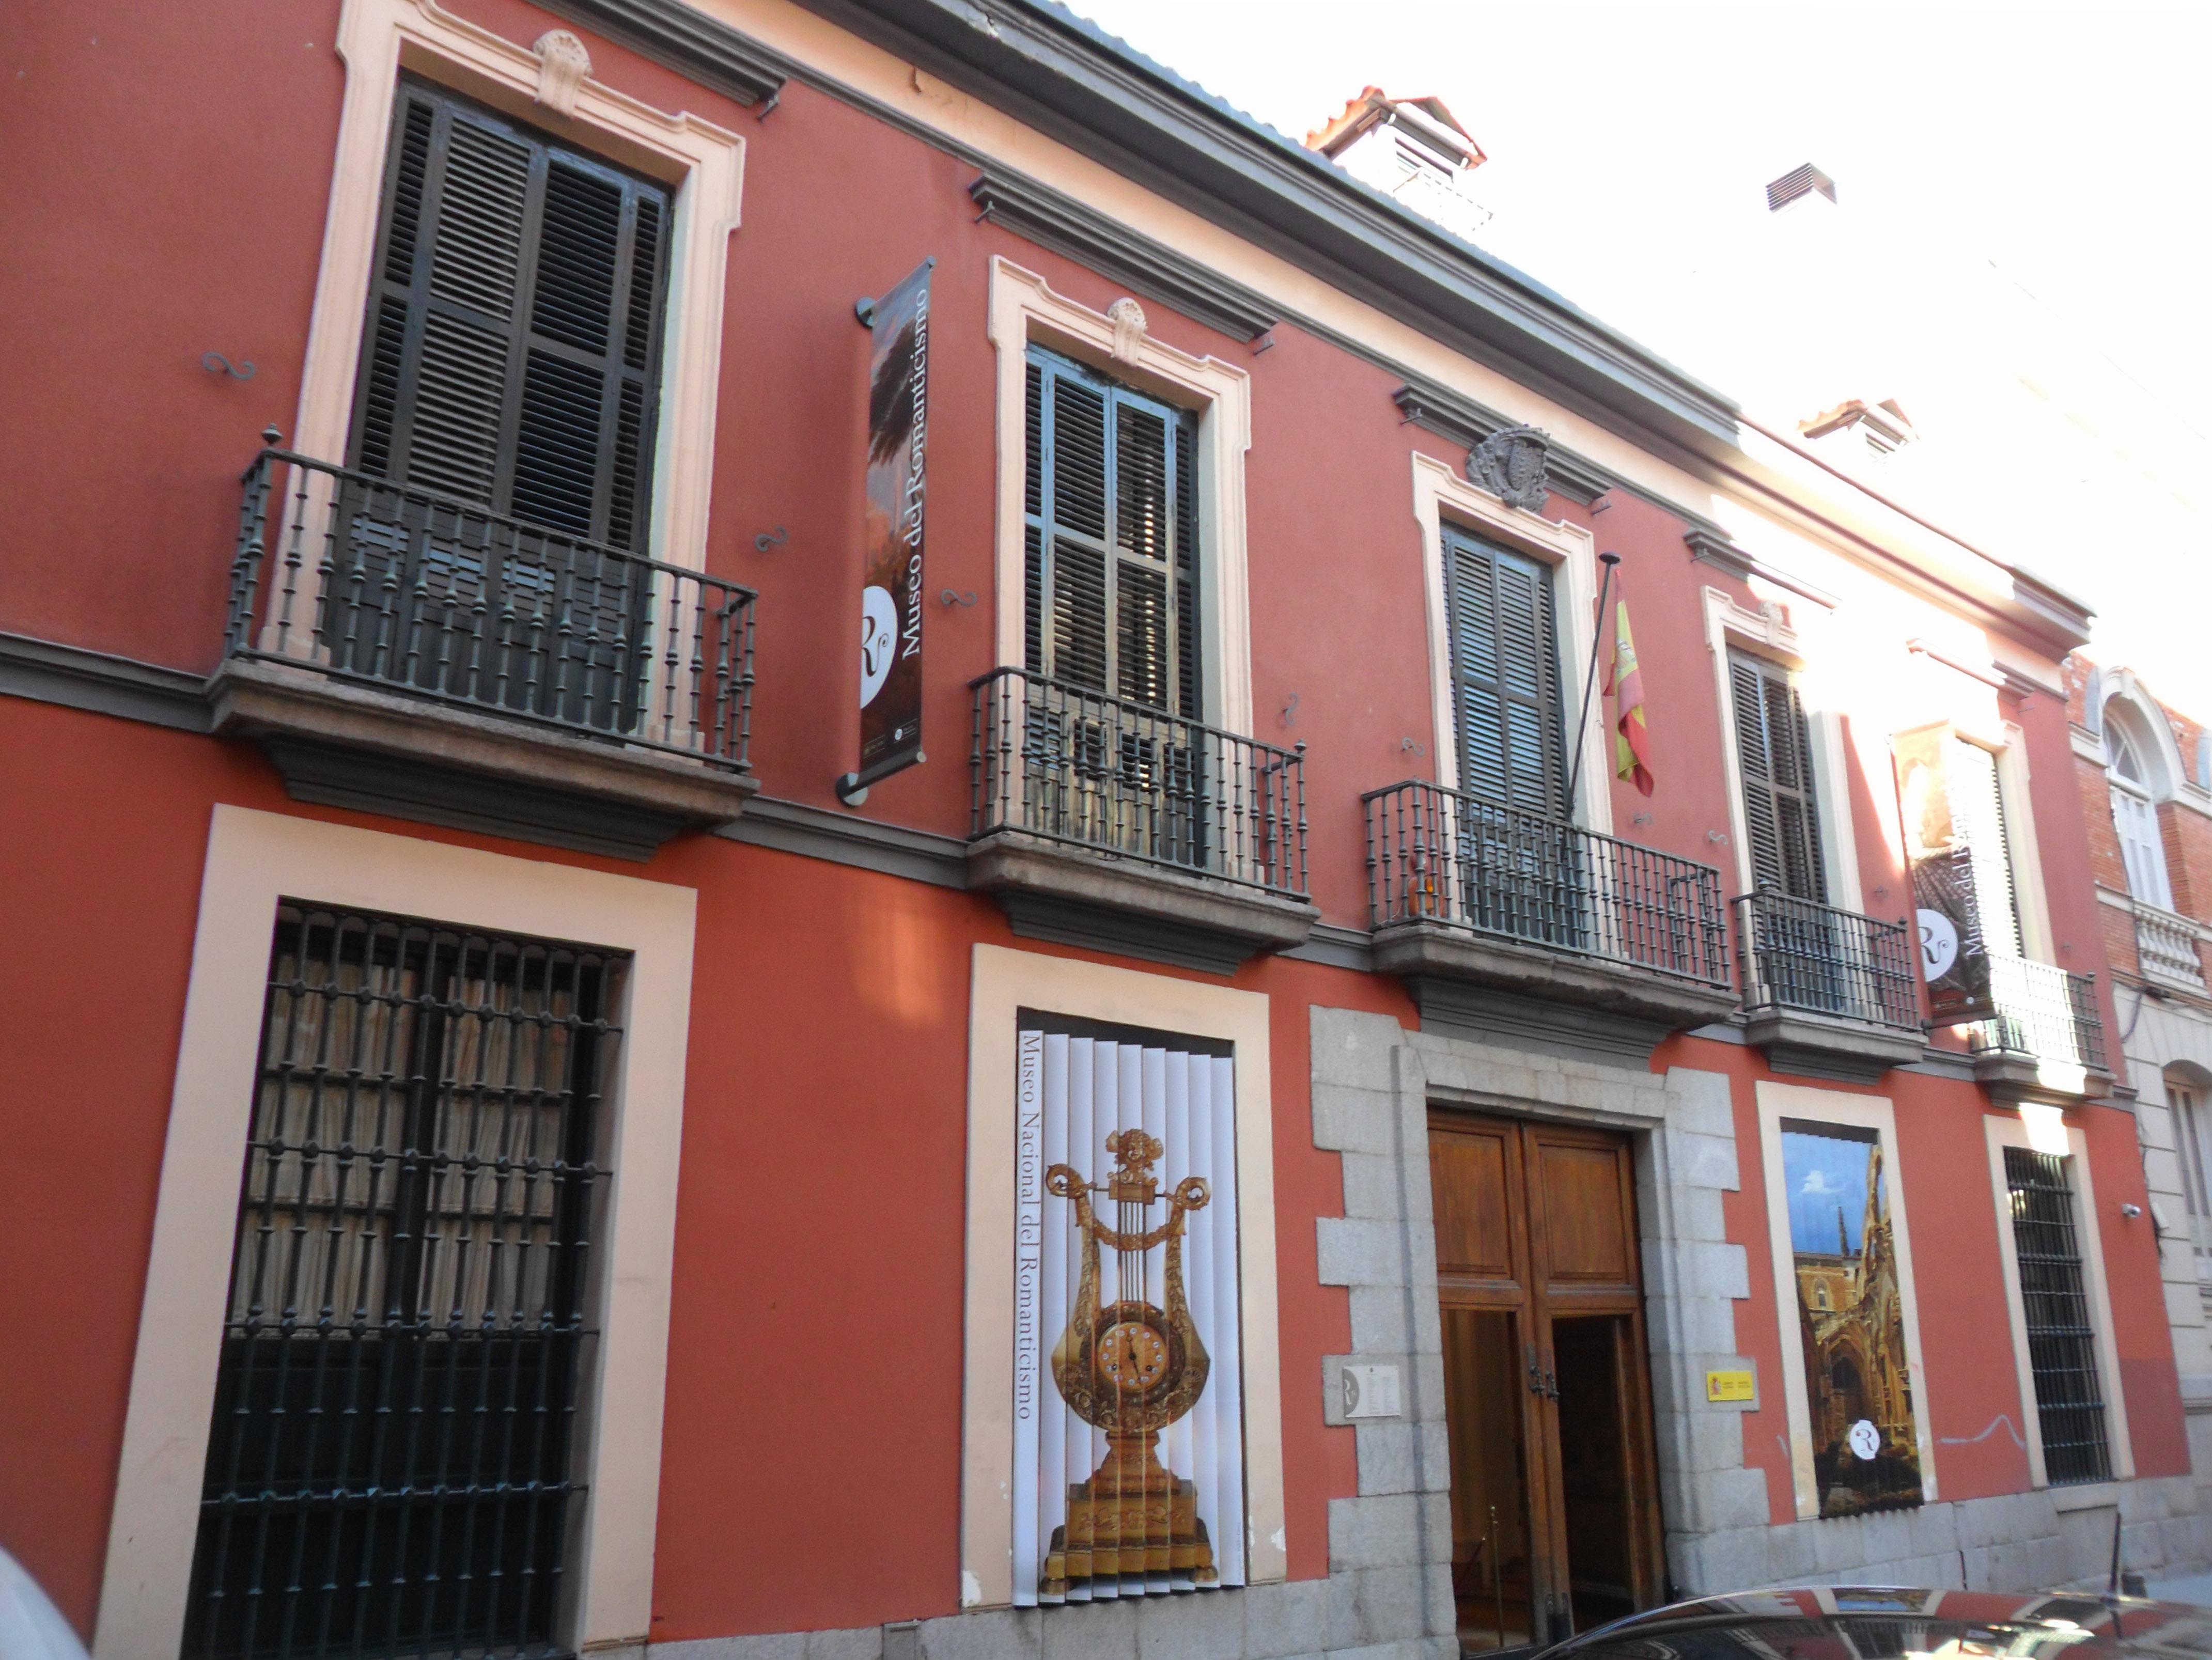 Museo Romantico.File Museo Romantico Madrid 03 Jpg Wikimedia Commons